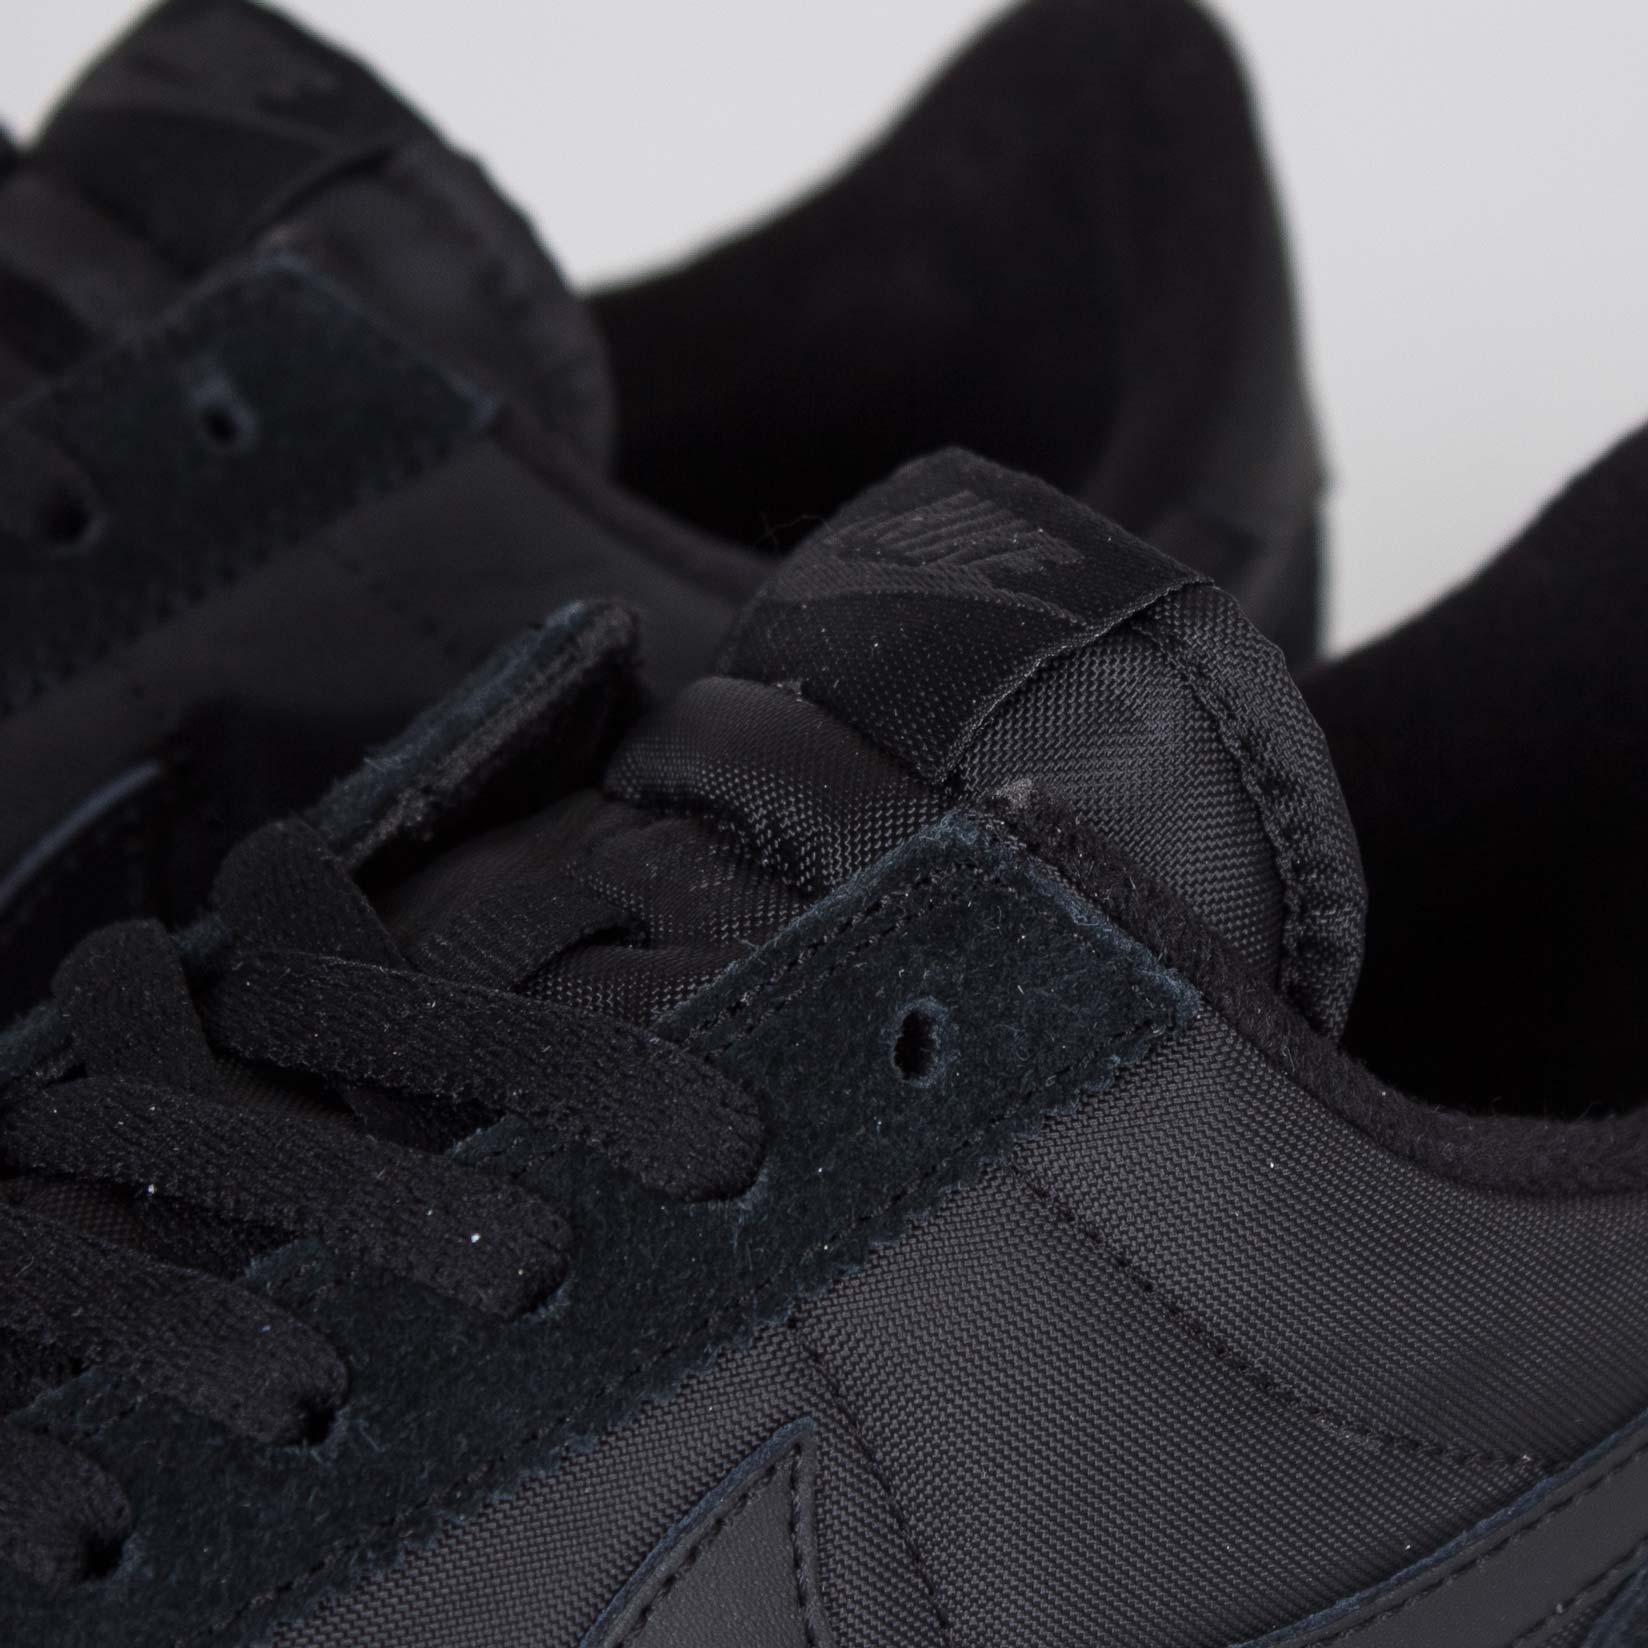 Nike Cortez Basic QS 1972 - 842918-001 - Sneakersnstuff  01a46858c